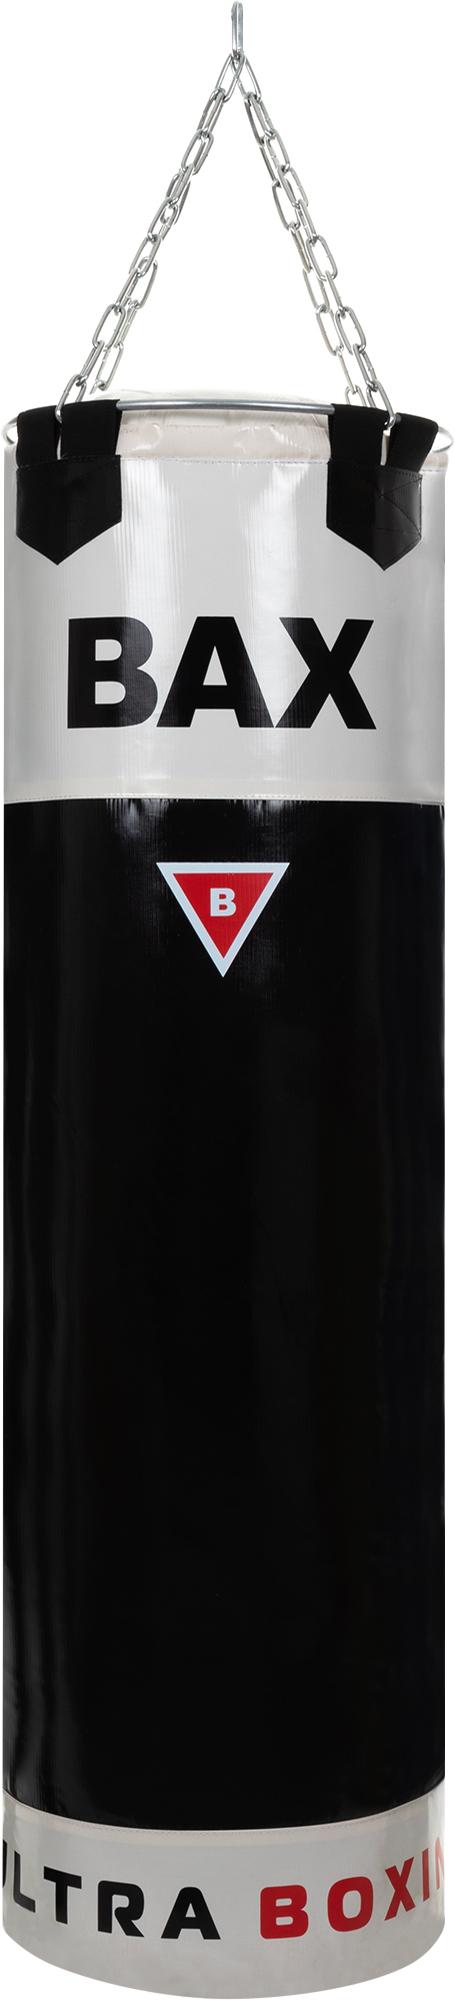 цена на Bax Мешок набивной Bax, 60 кг